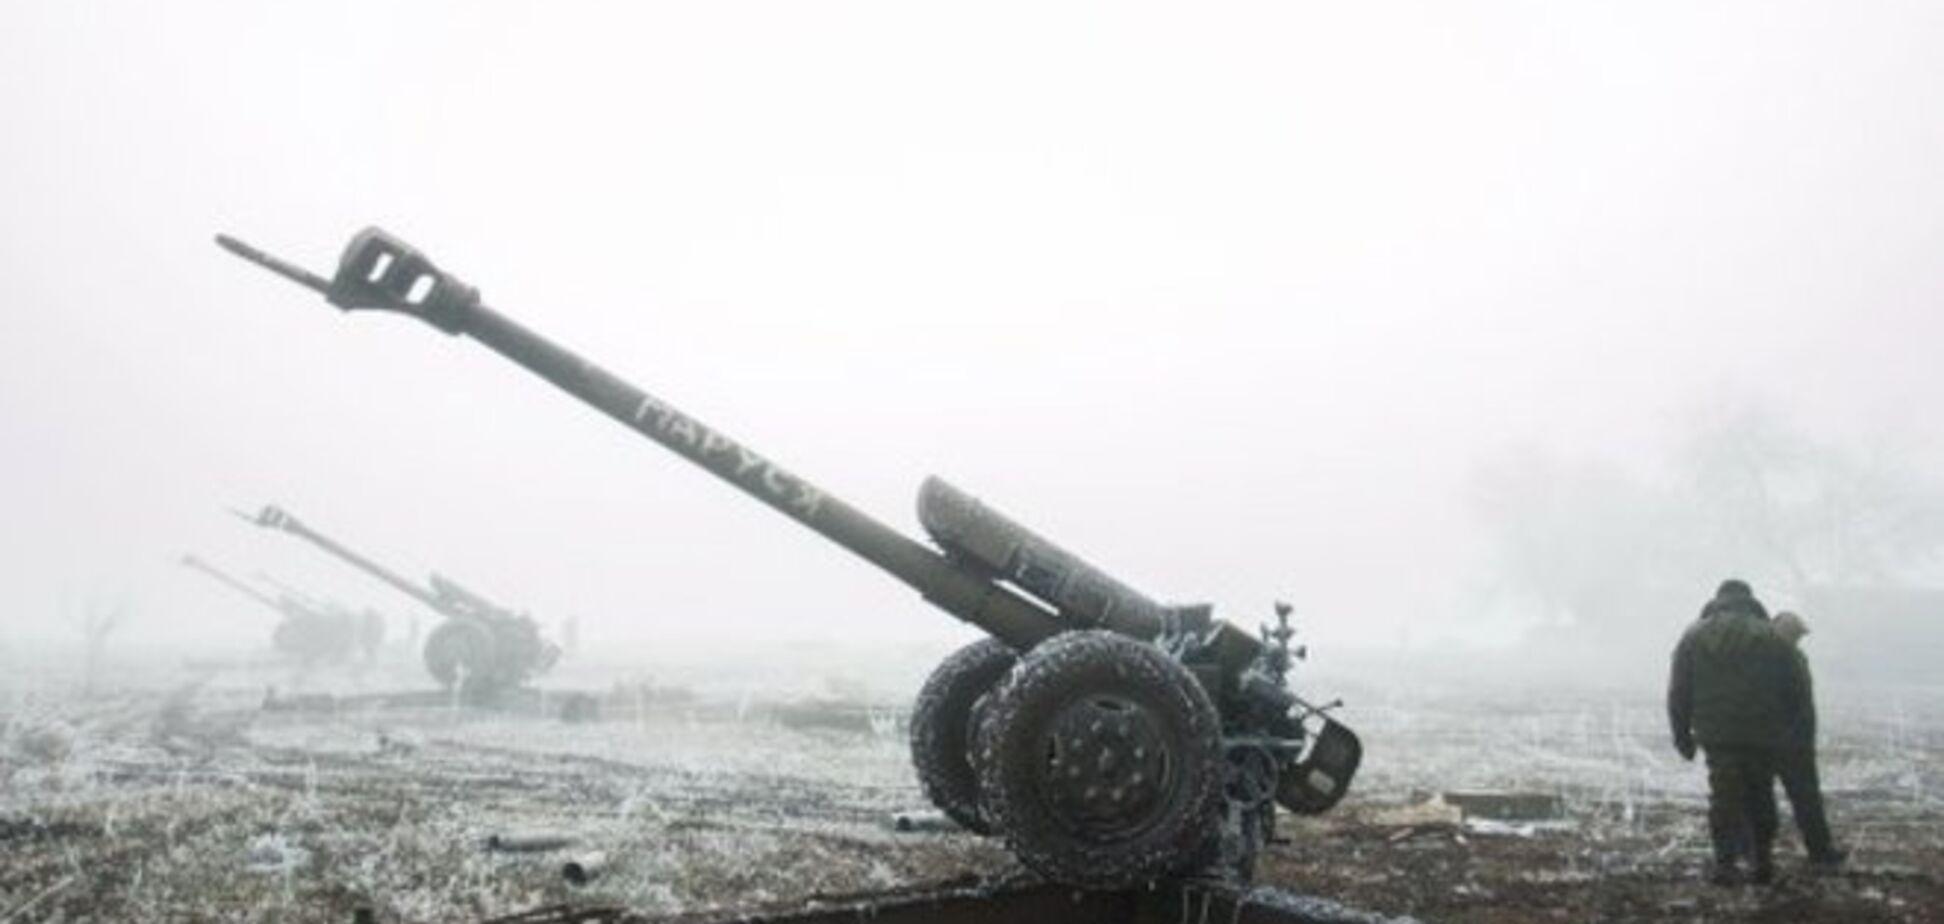 Террористы 'ЛНР' лишь имитируют 'отвод тяжелой техники' - Тымчук